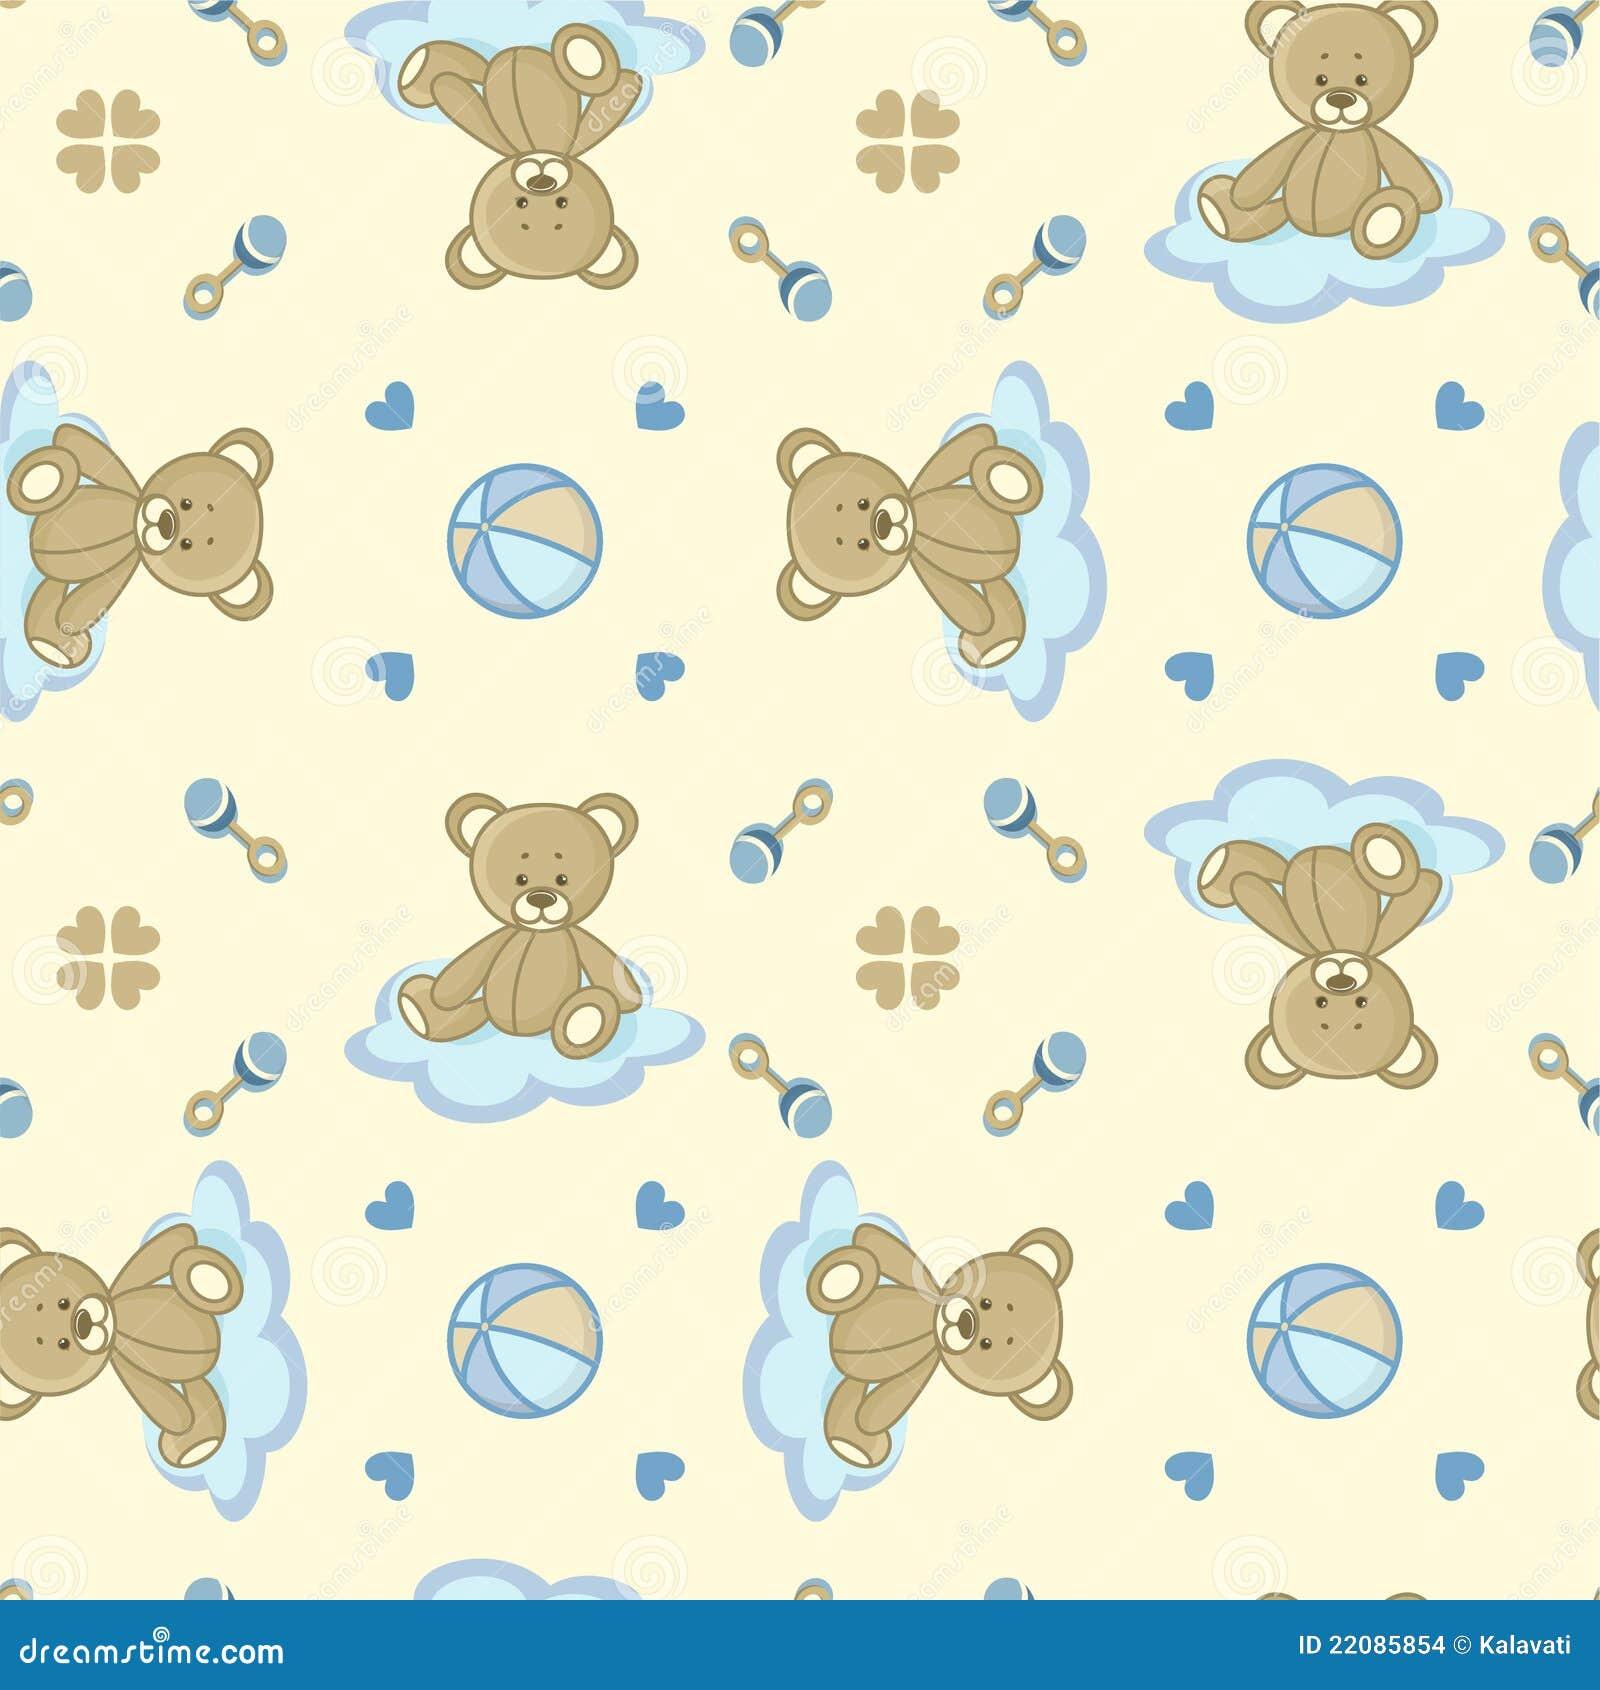 Cute Teddy Bear Heart Drawing